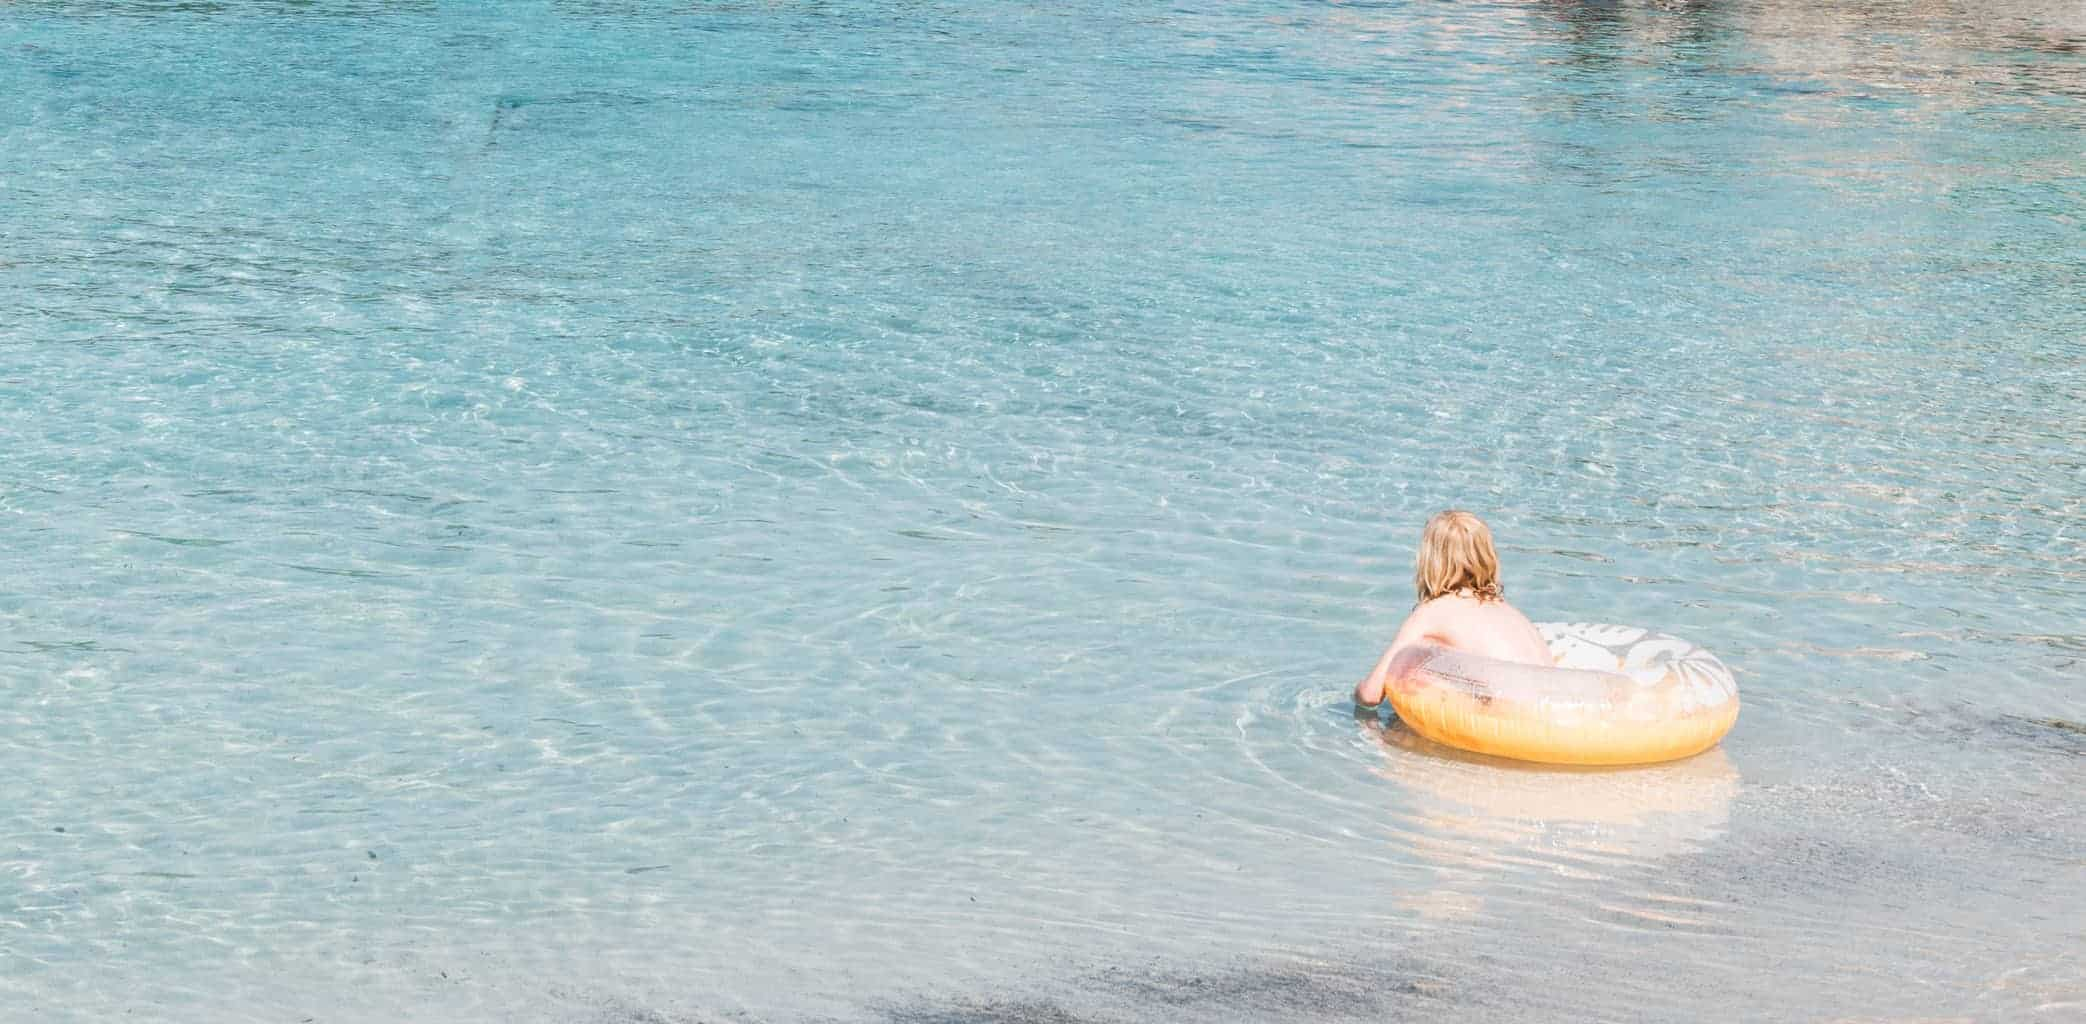 Girl swimming at S'Amarador beach in Mallorca